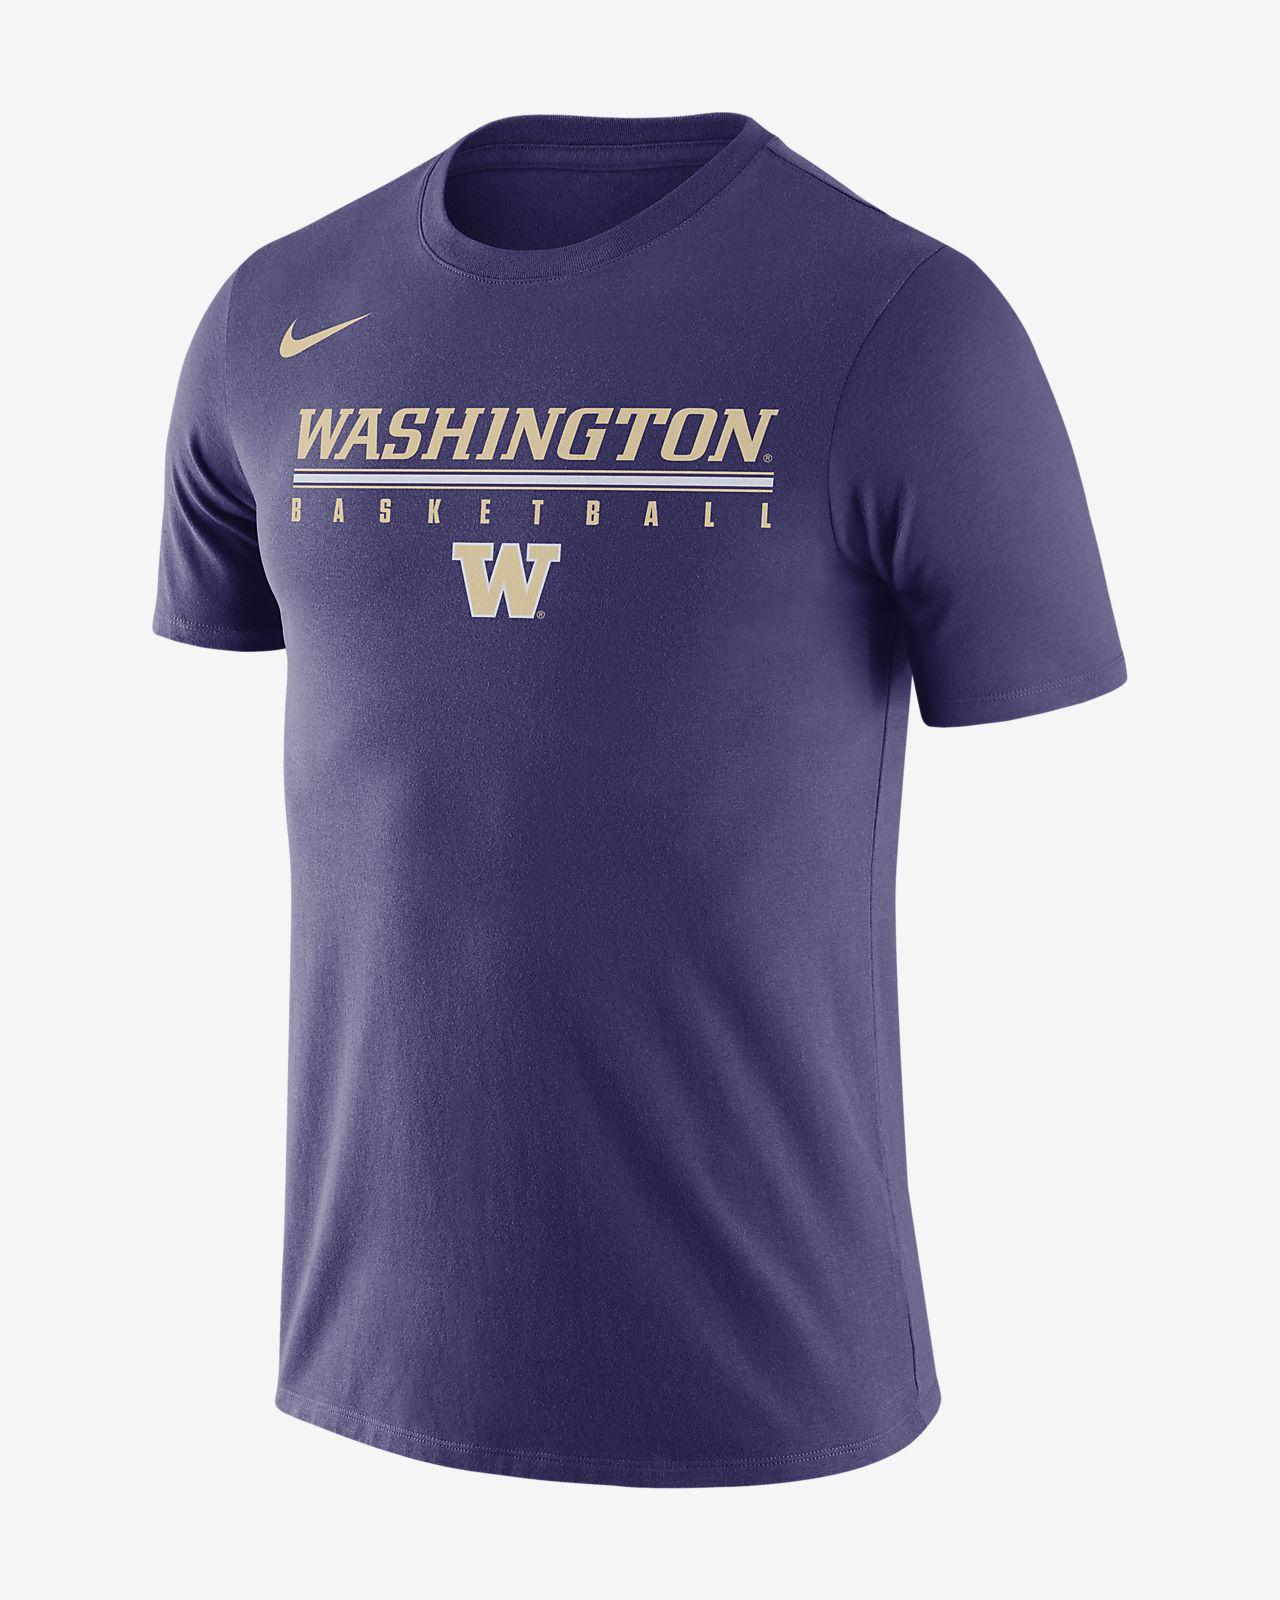 405bb862fab6 Nike College Dri-FIT Legend (Washington) Men s T-Shirt. Nike.com